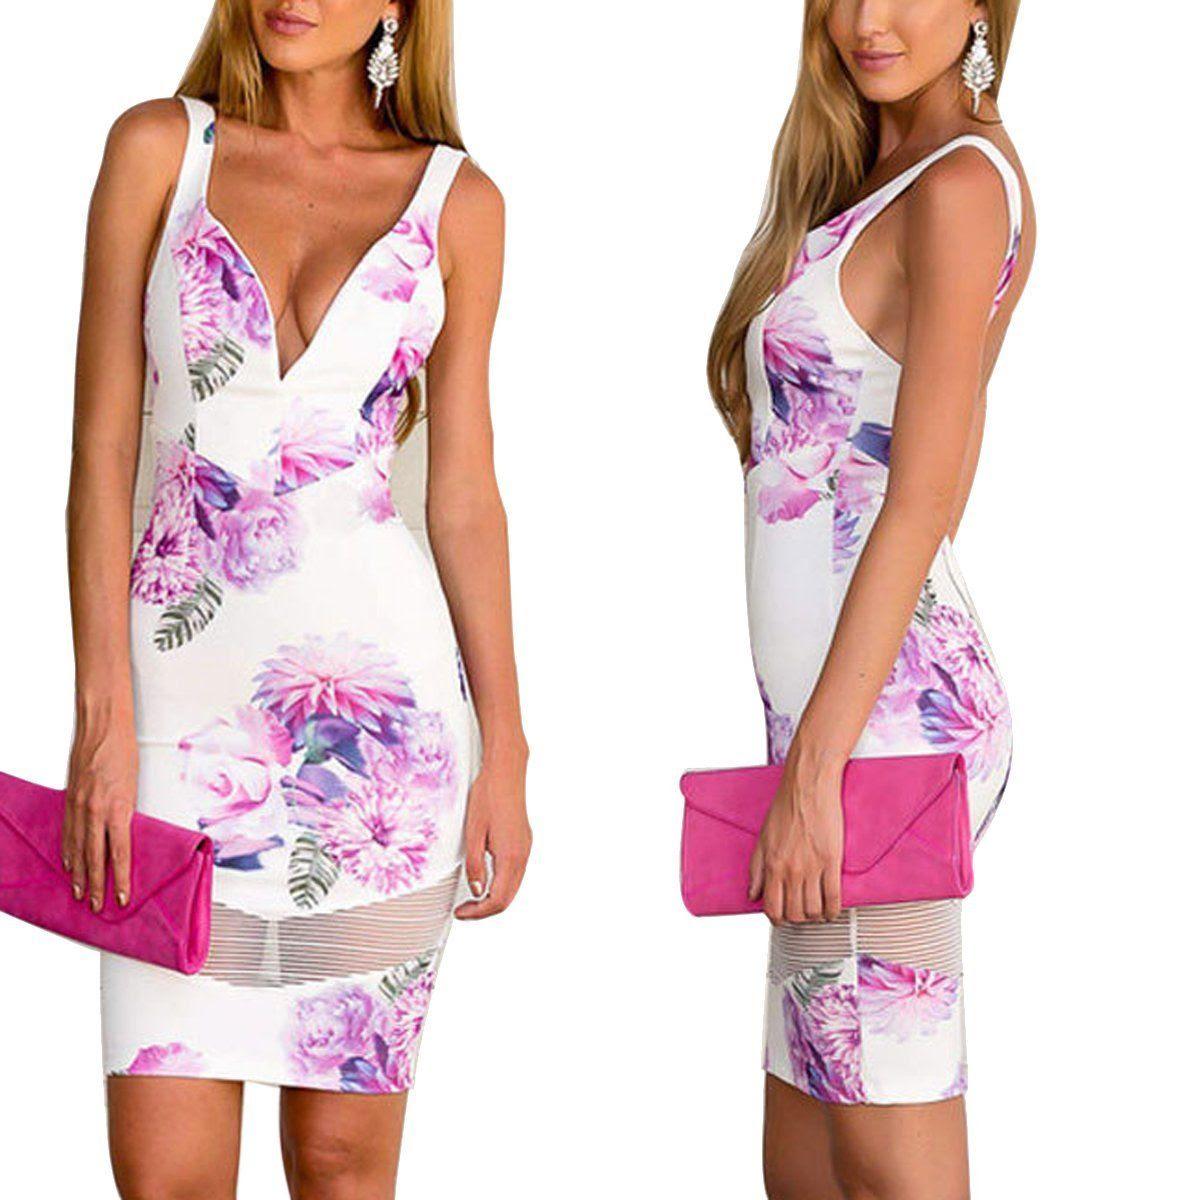 Dress dresses evening v collar floral bodycon online shopping sites